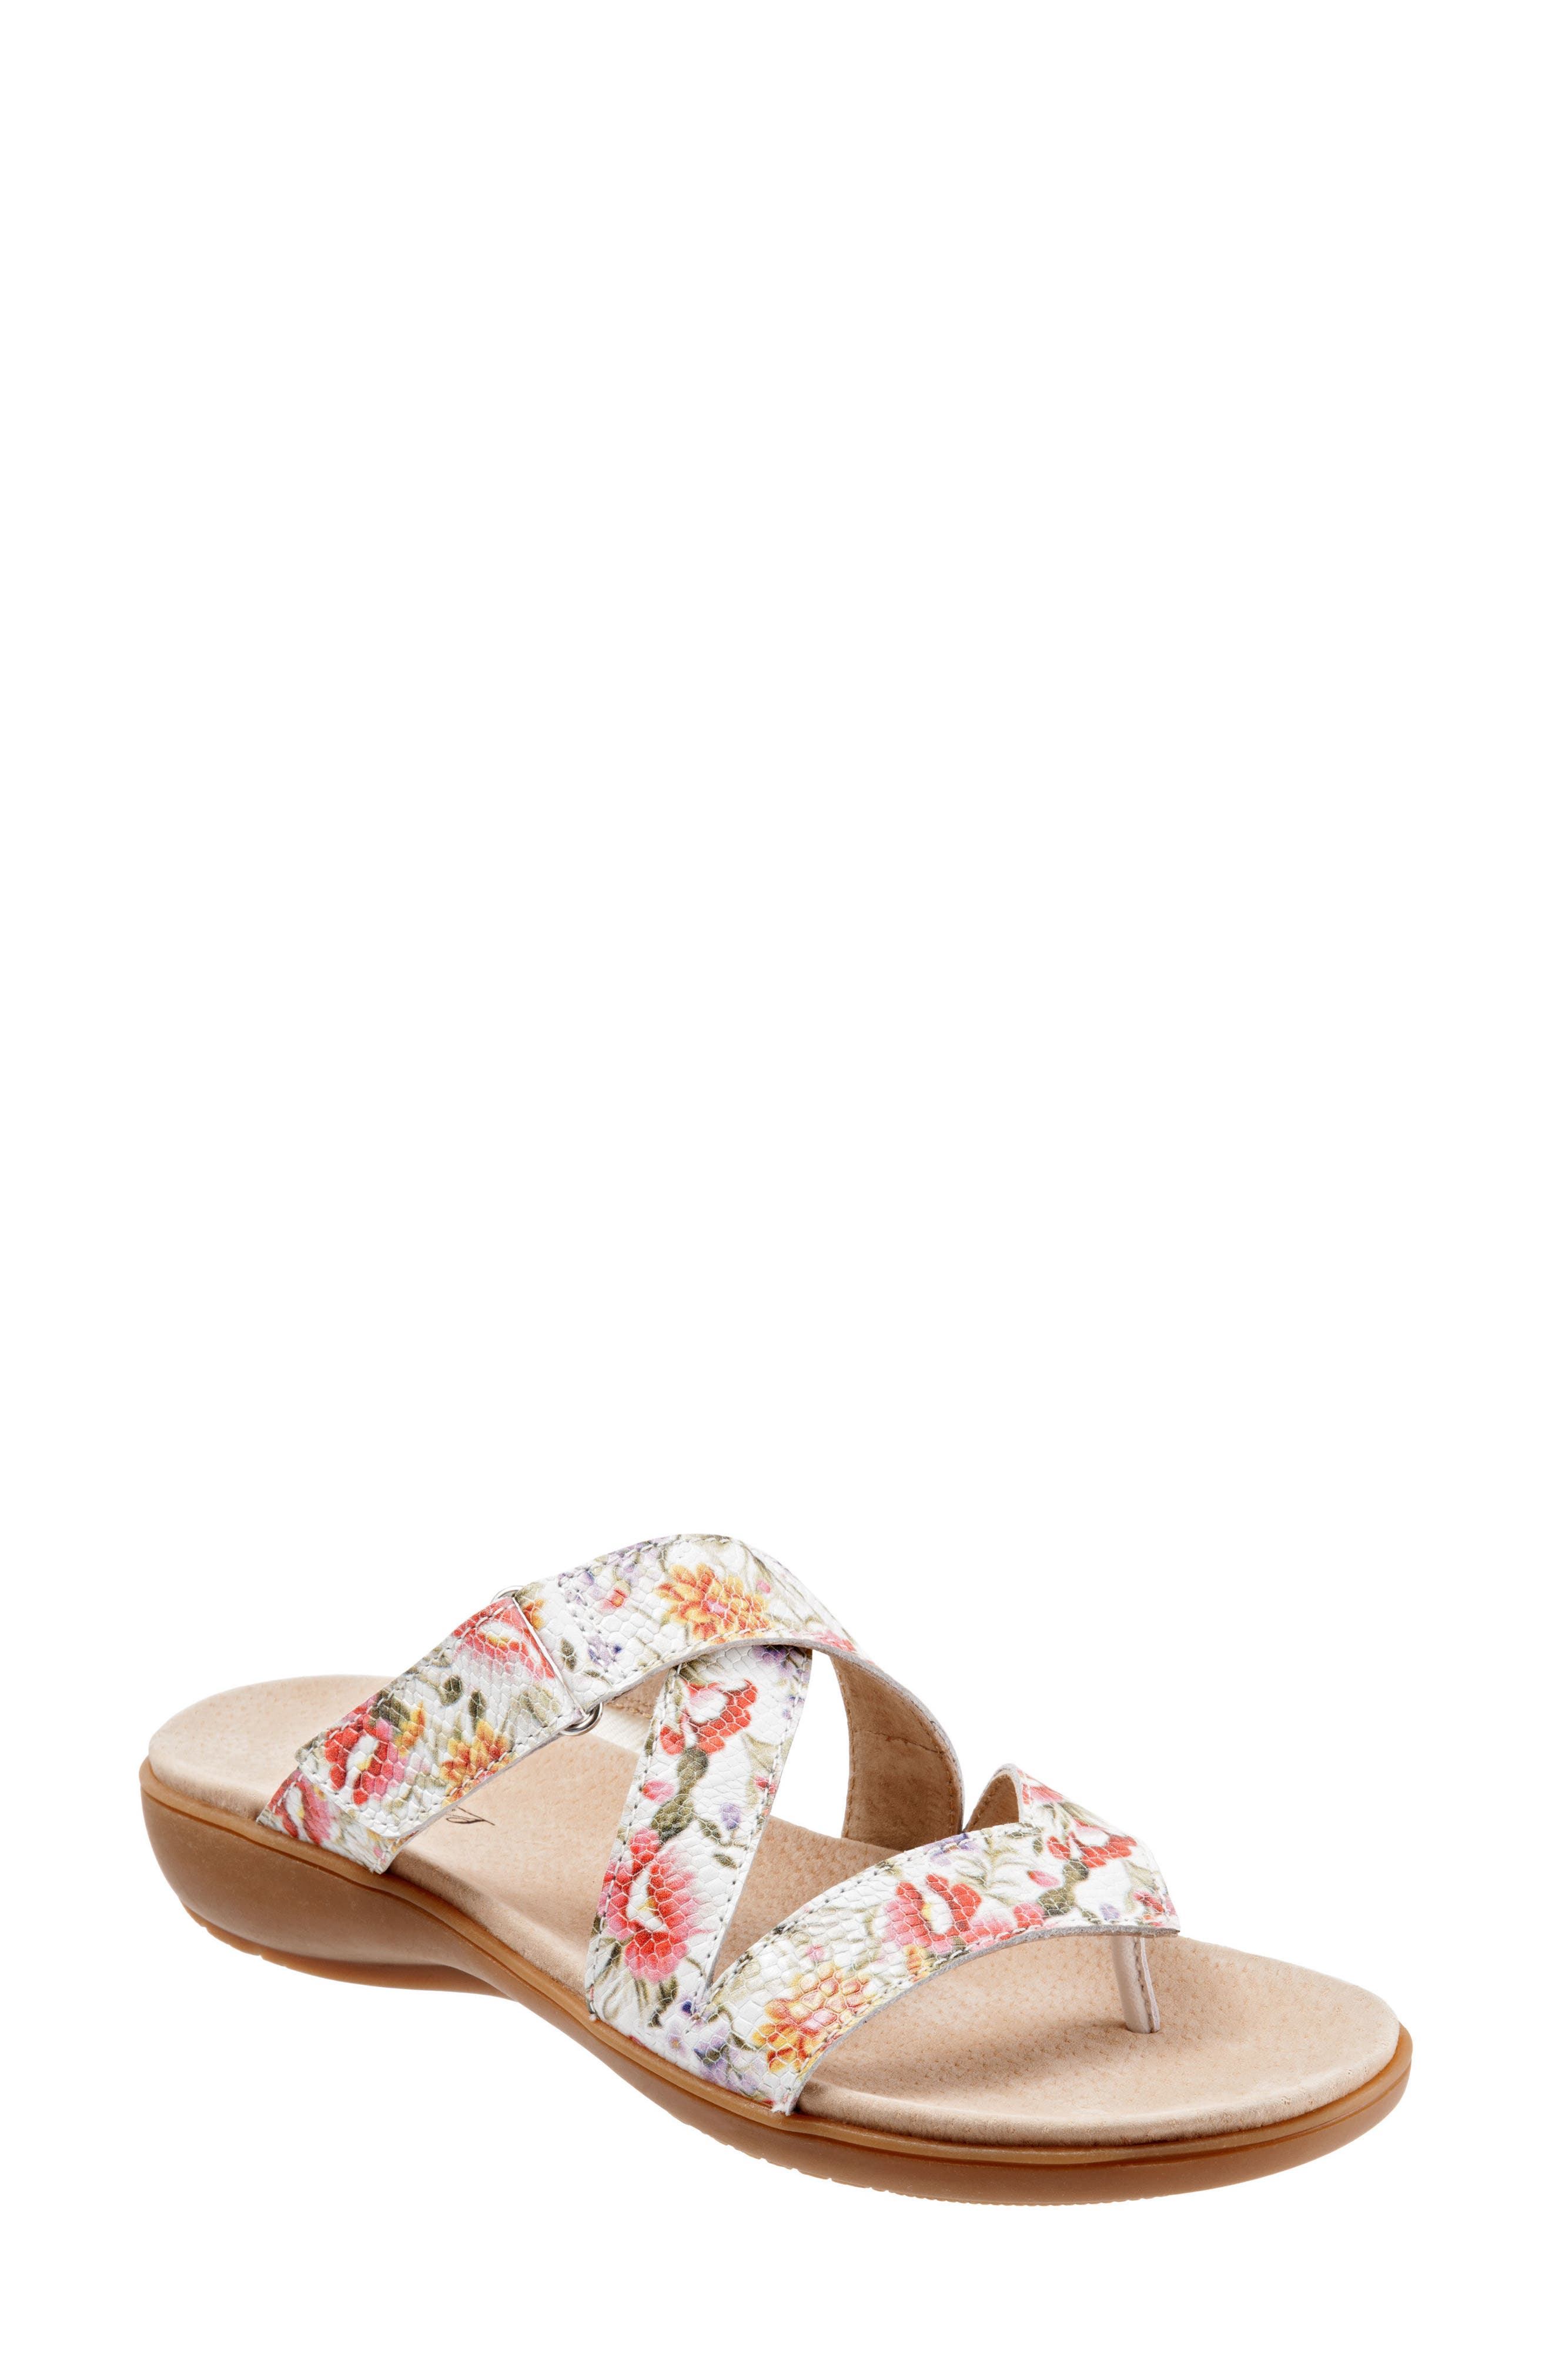 Komet Thong Sandal,                         Main,                         color, Off White Floral Leather